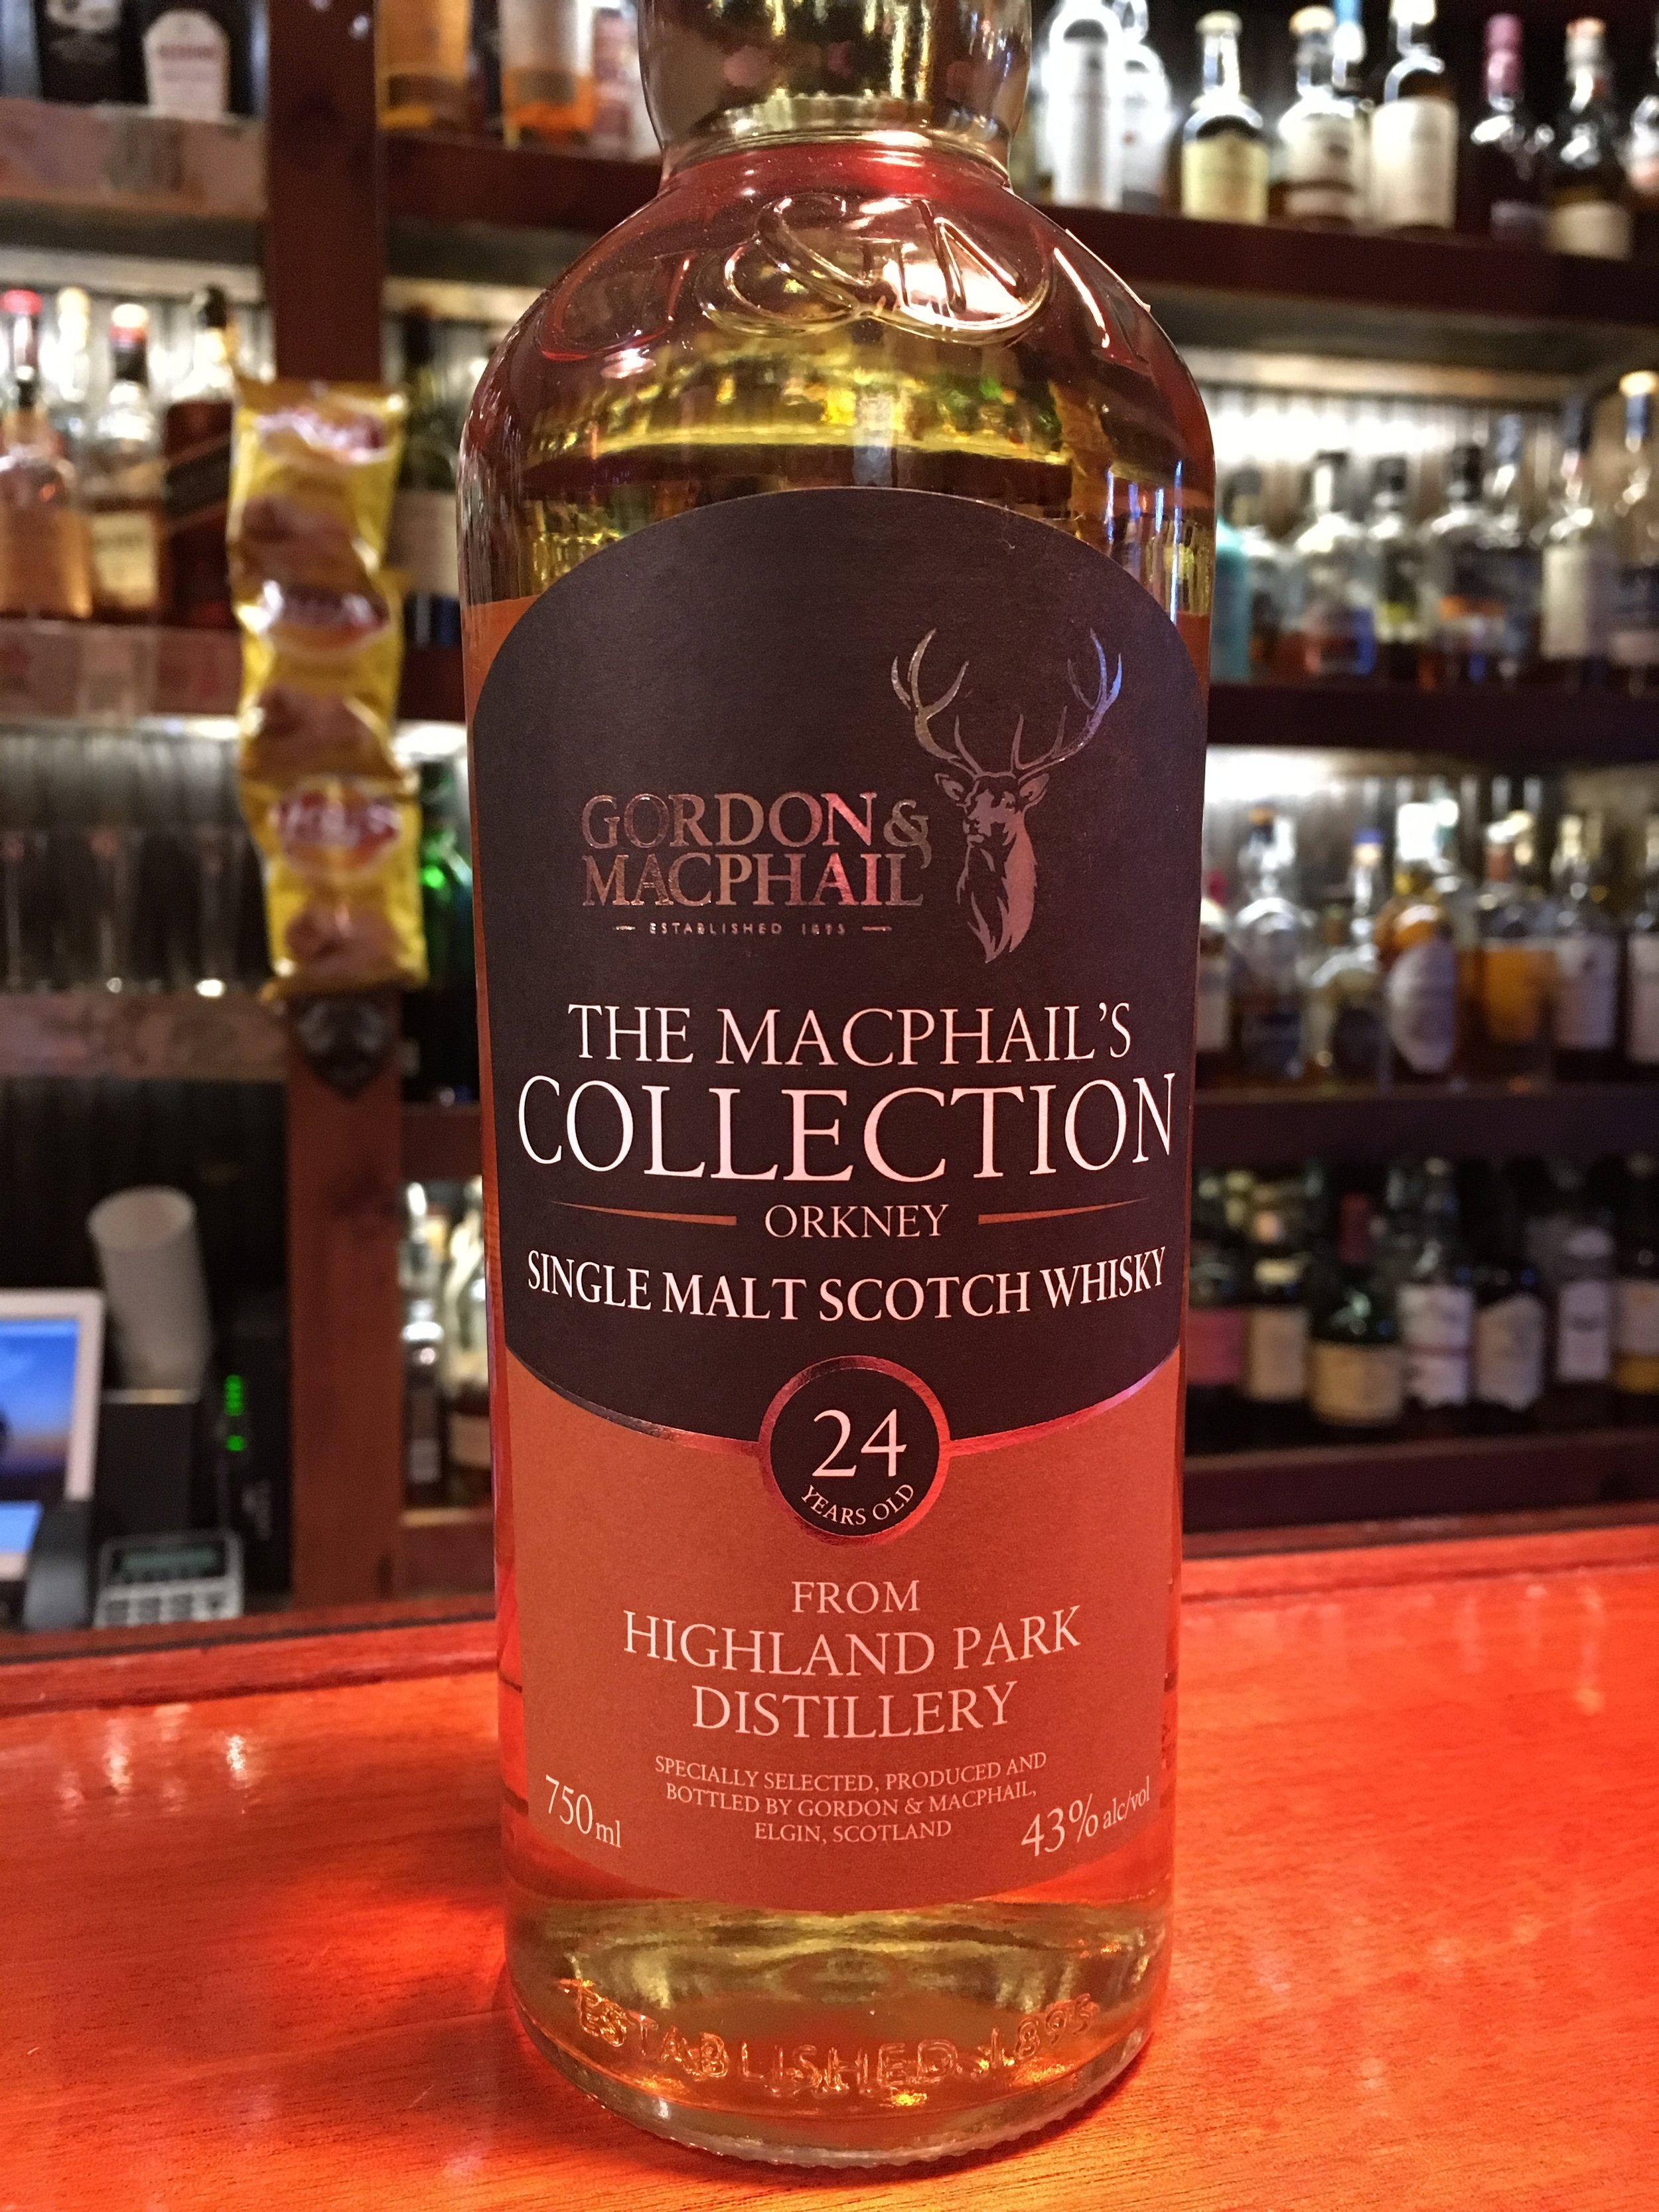 24 Year Old | 43% ABV - Distillery | Highland Park